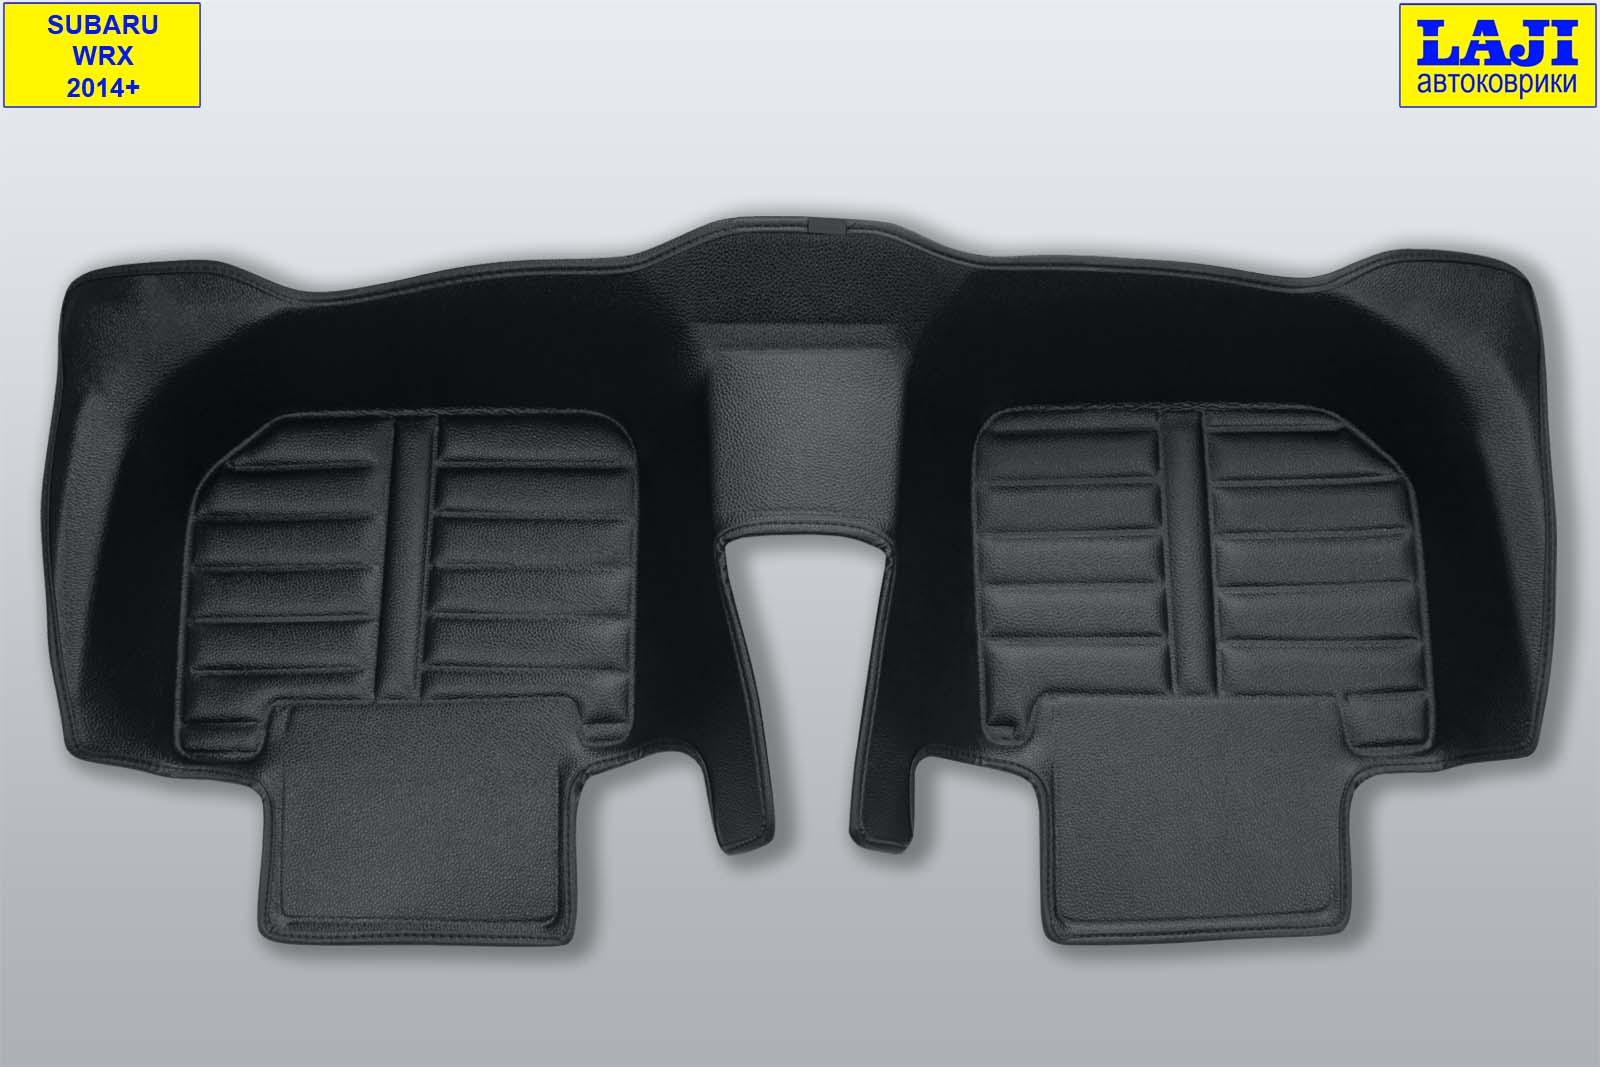 5D коврики в салон Subaru WRX 2014-н.в. 9